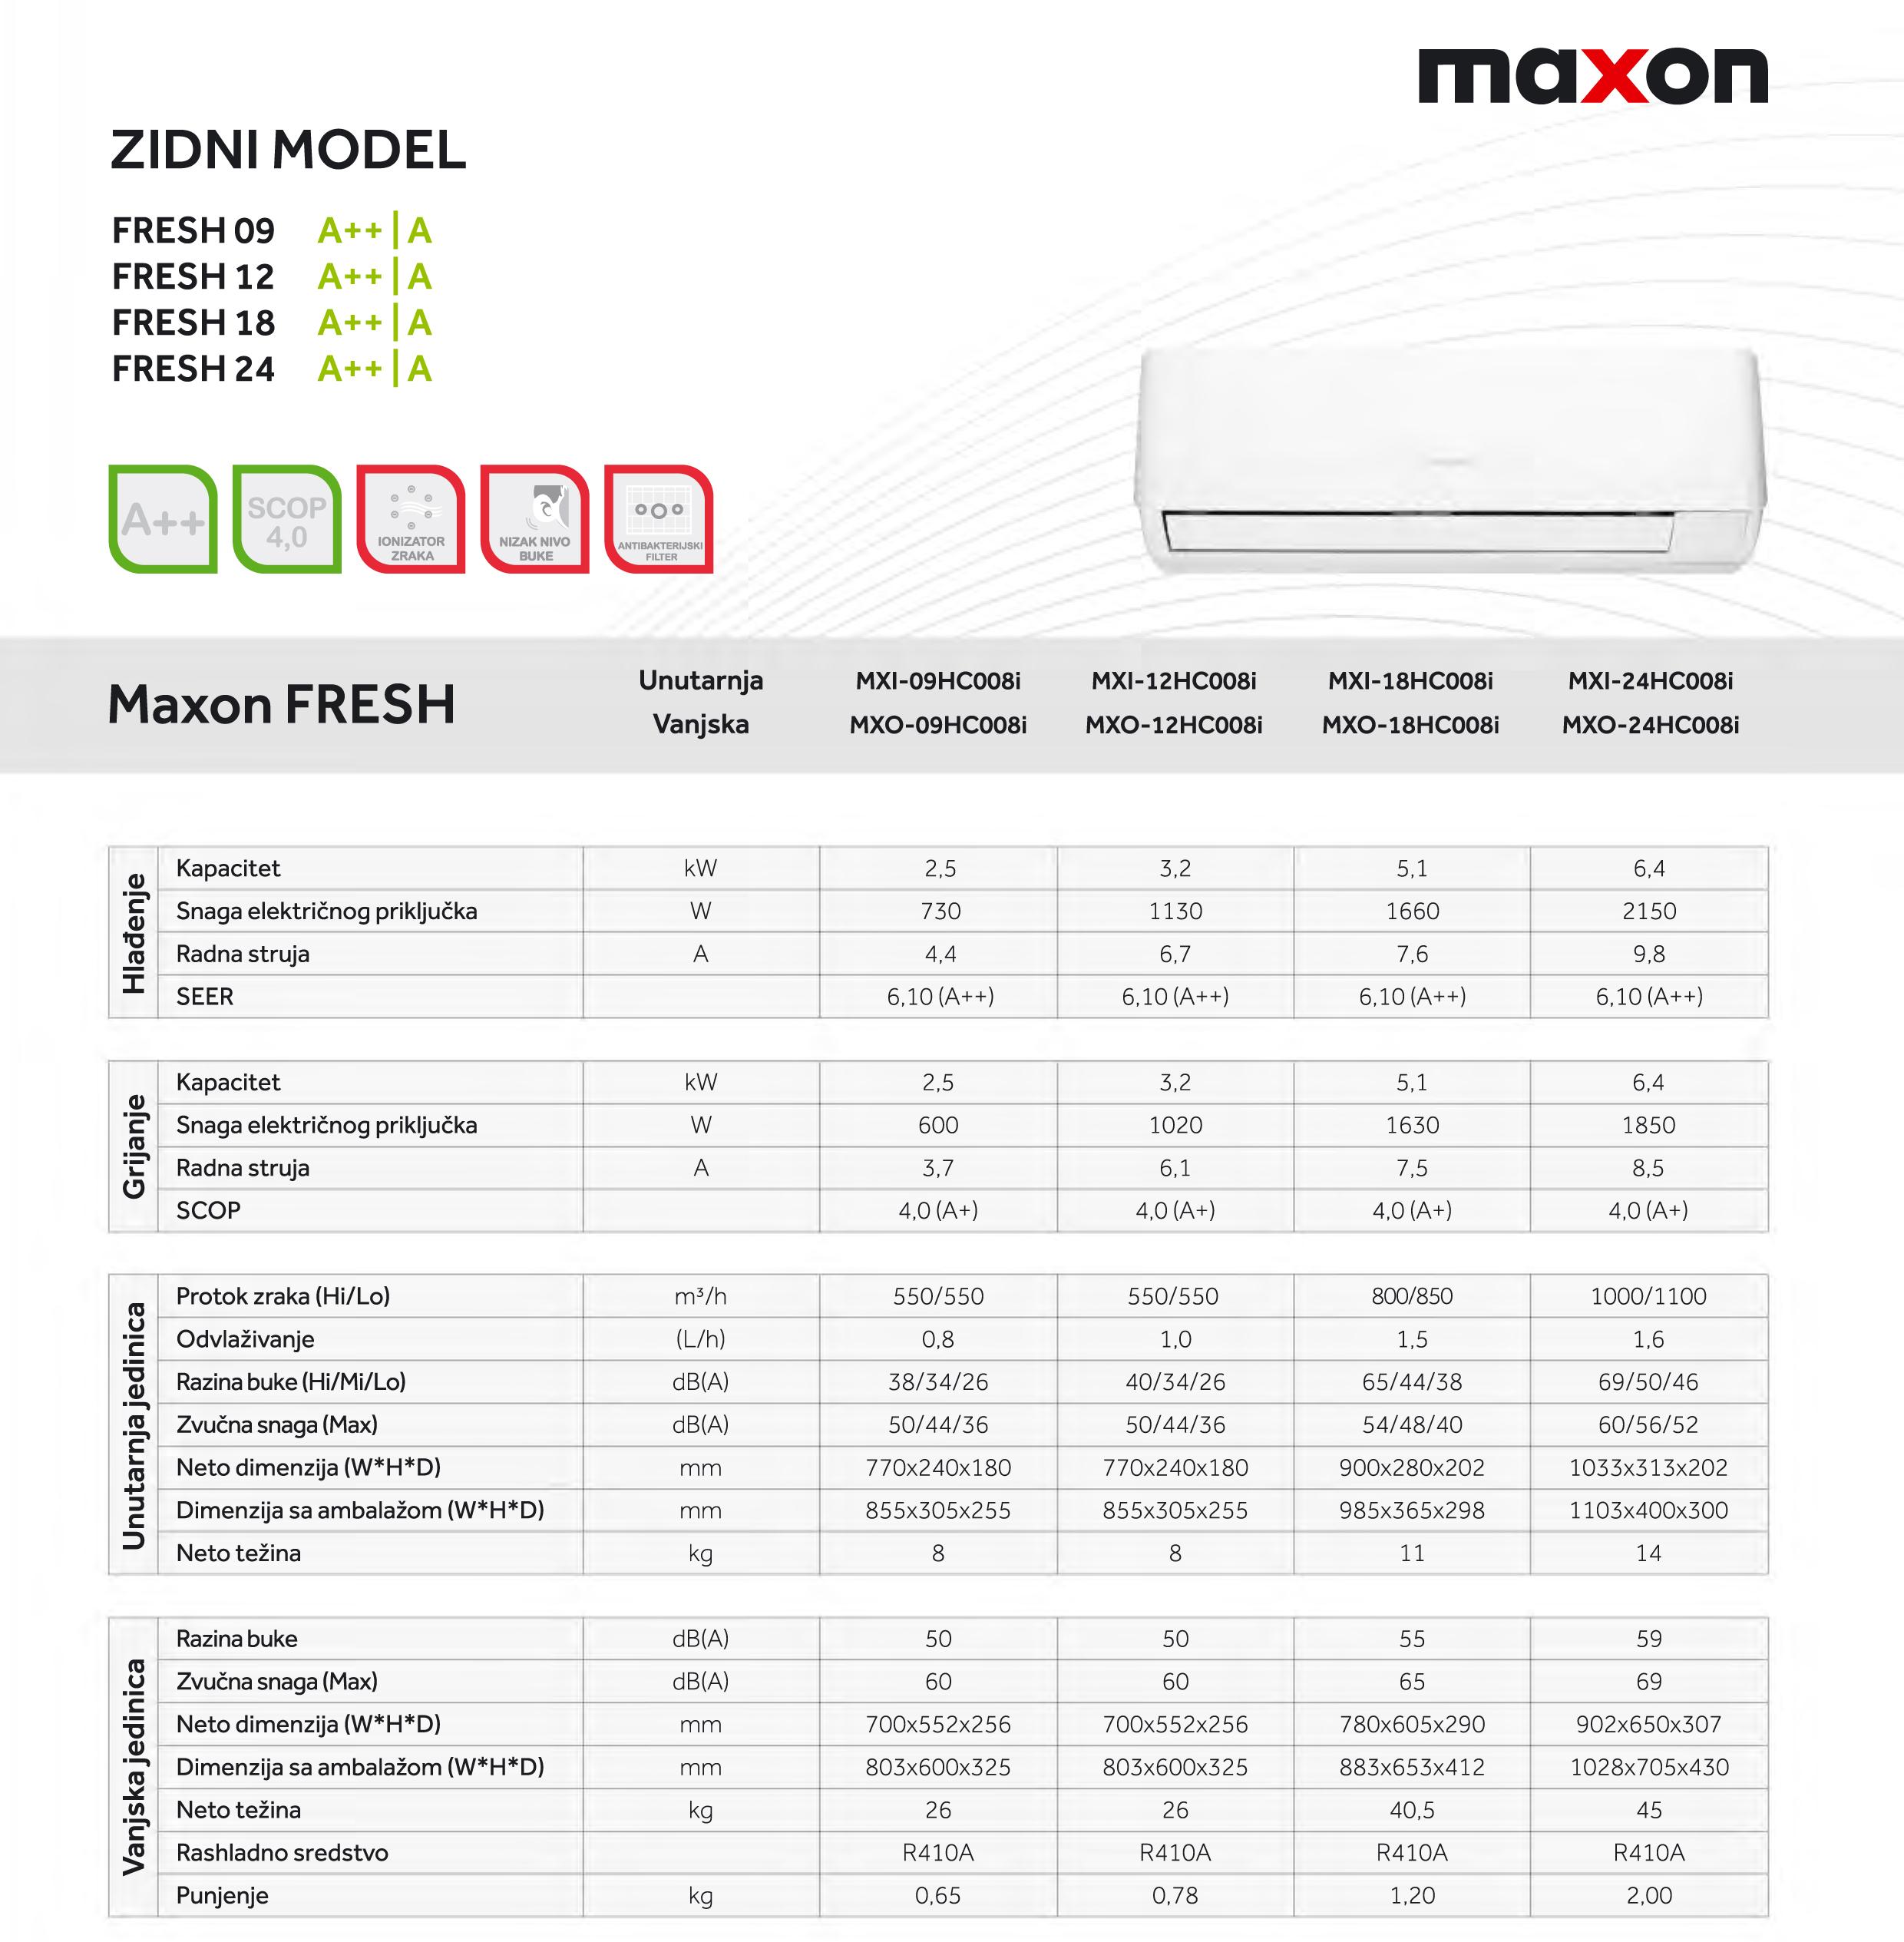 maxon karakteristike 2